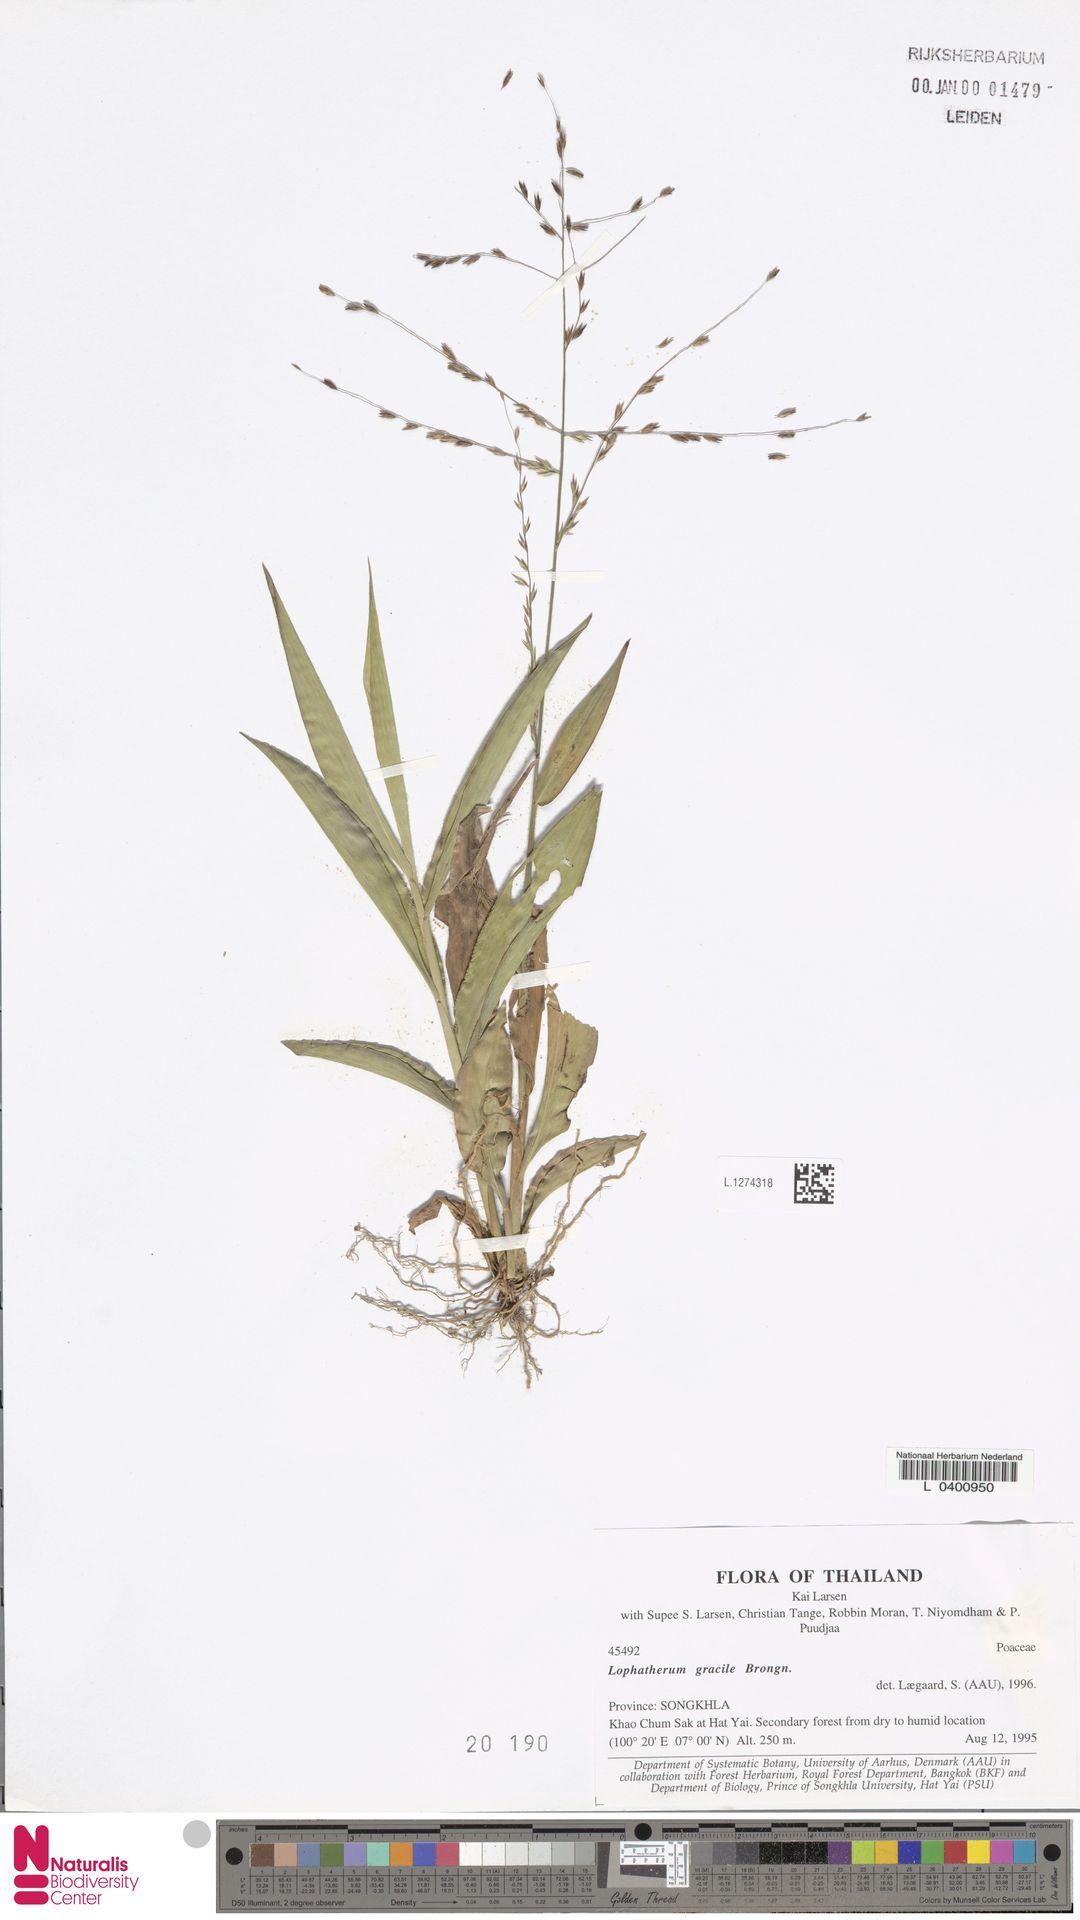 L.1274318 | Lophatherum gracile Brongn.